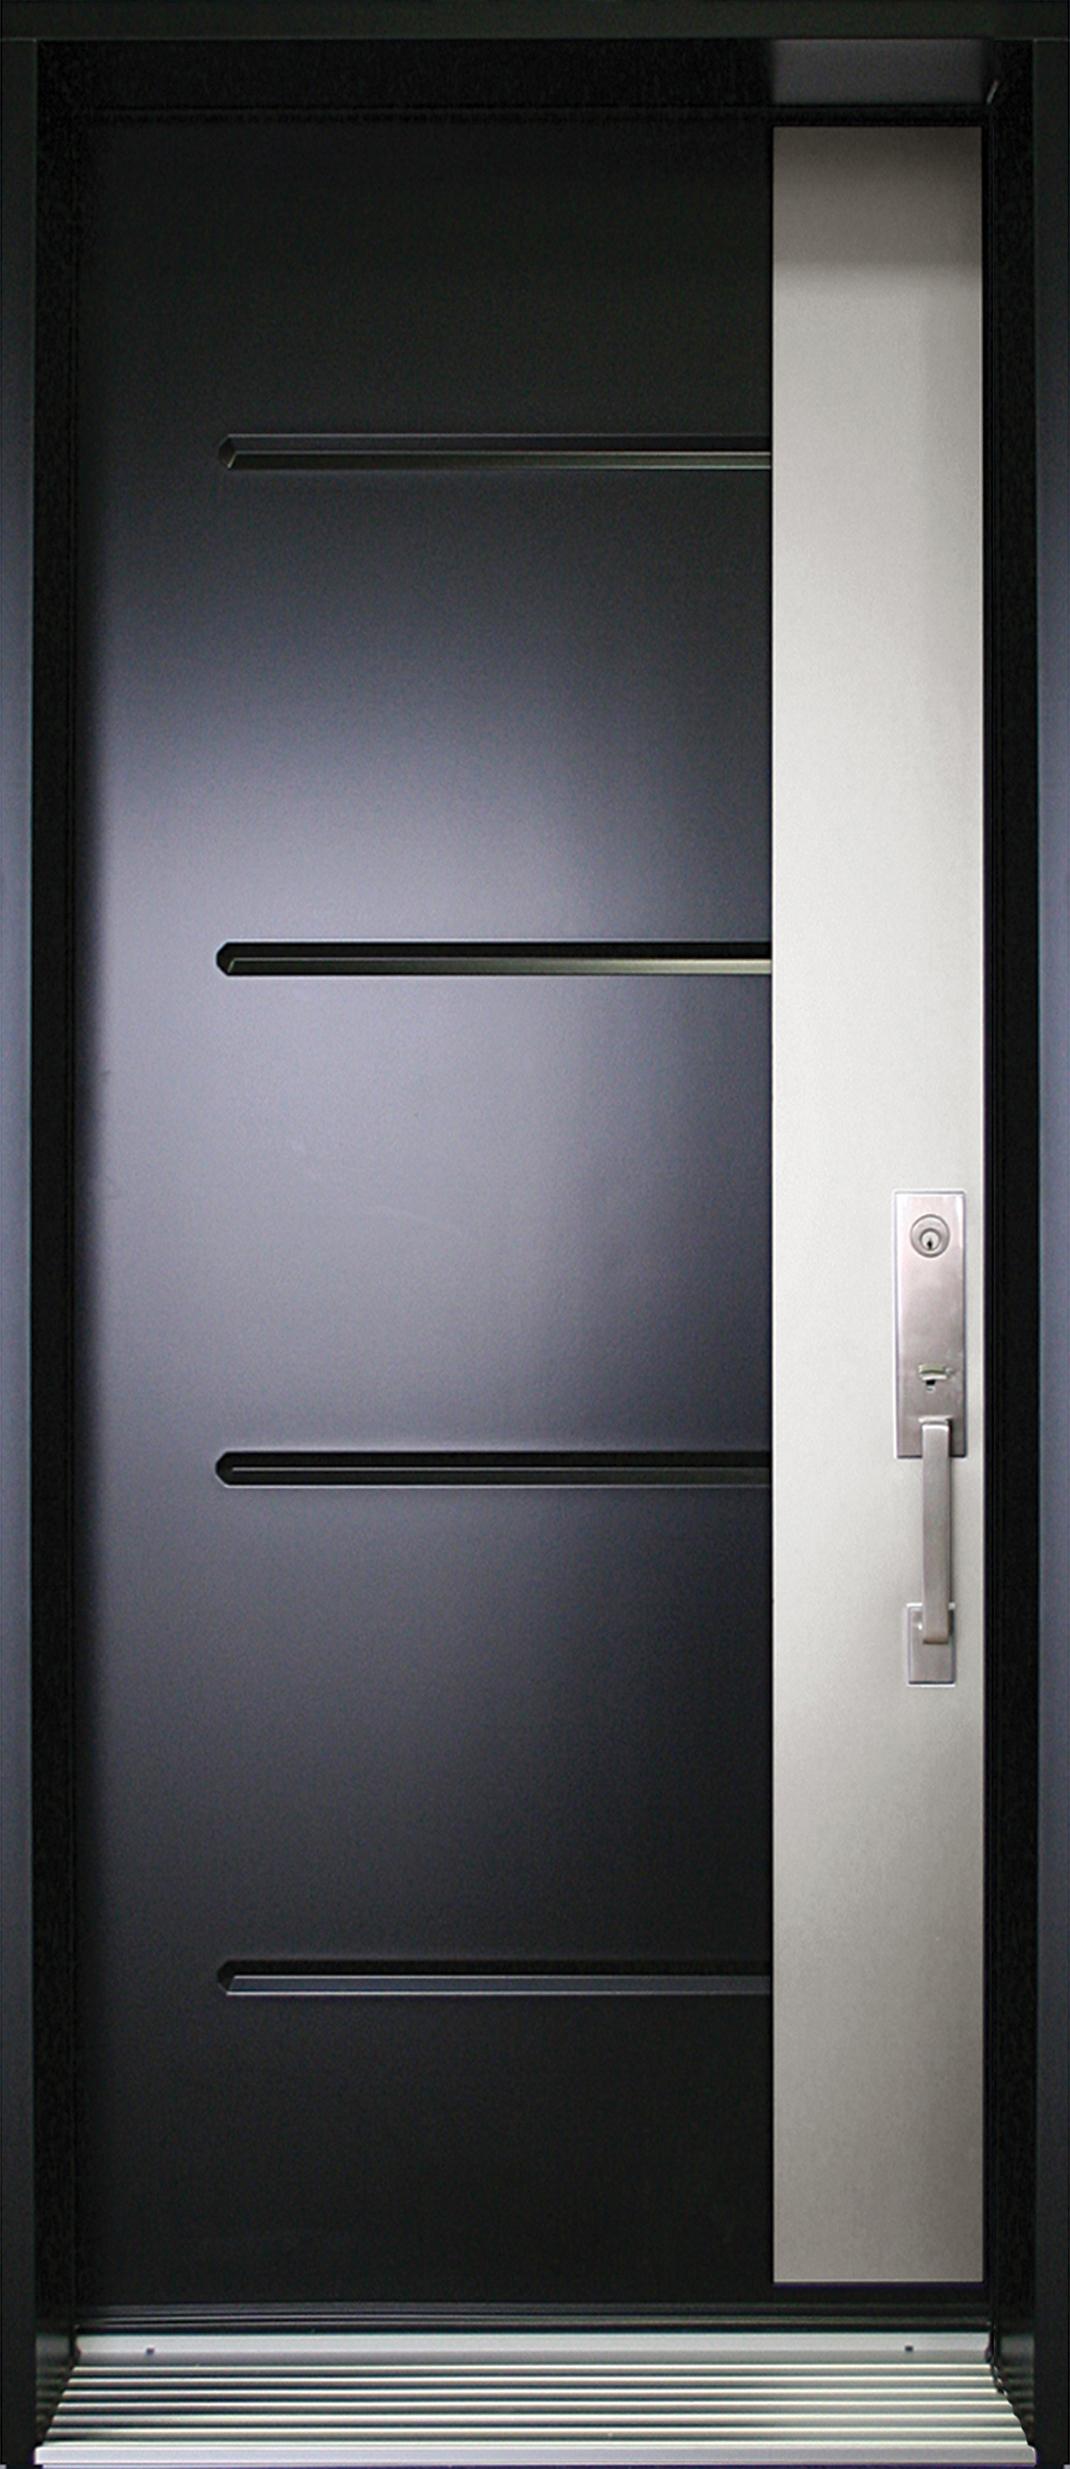 Mod le de porte contemporaine alpha8 portatec - Porte d entree acier ou alu ...